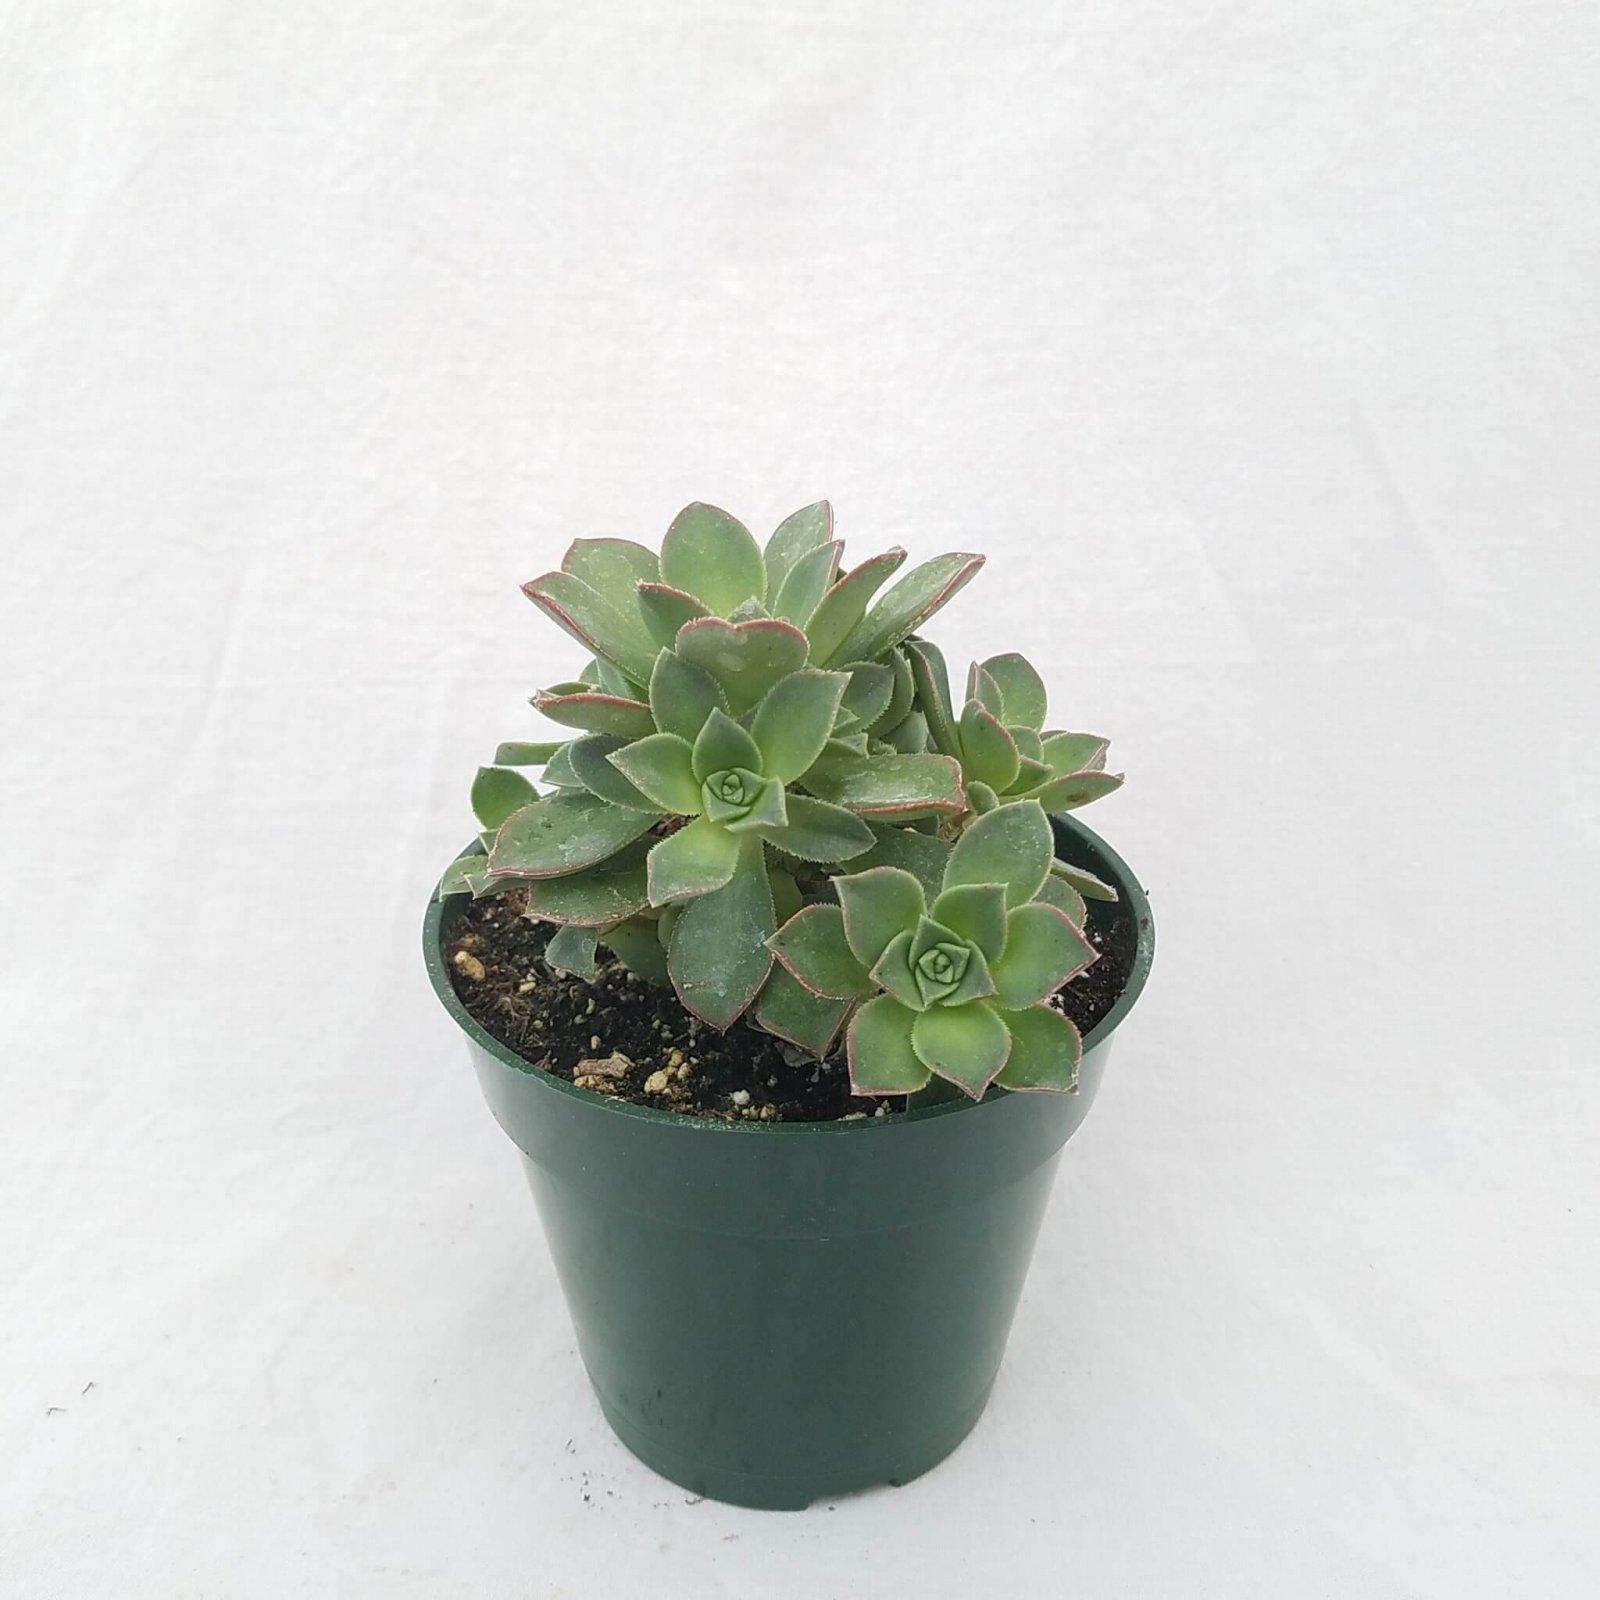 Aeonium haworthii 'Pinwheel' - 4 1/2